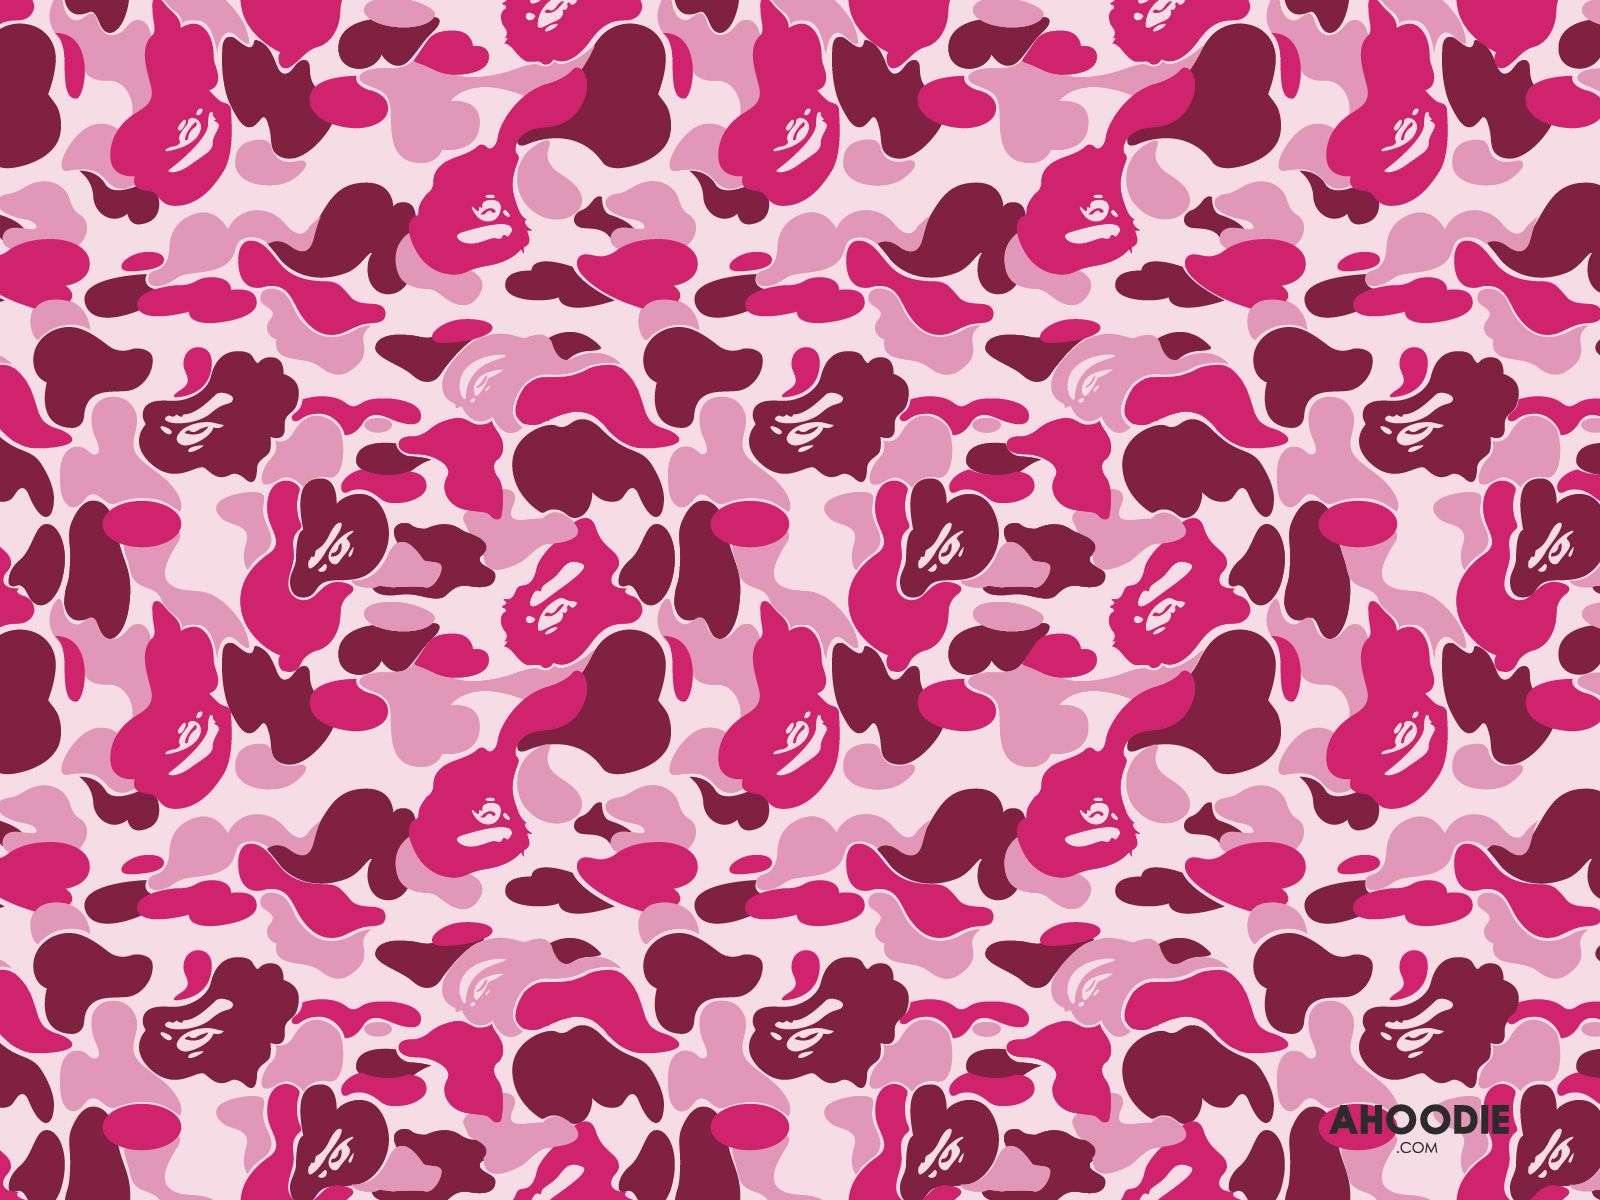 bapecamowallpaperdesktop_pink.jpg 1,600×1,200 pixels